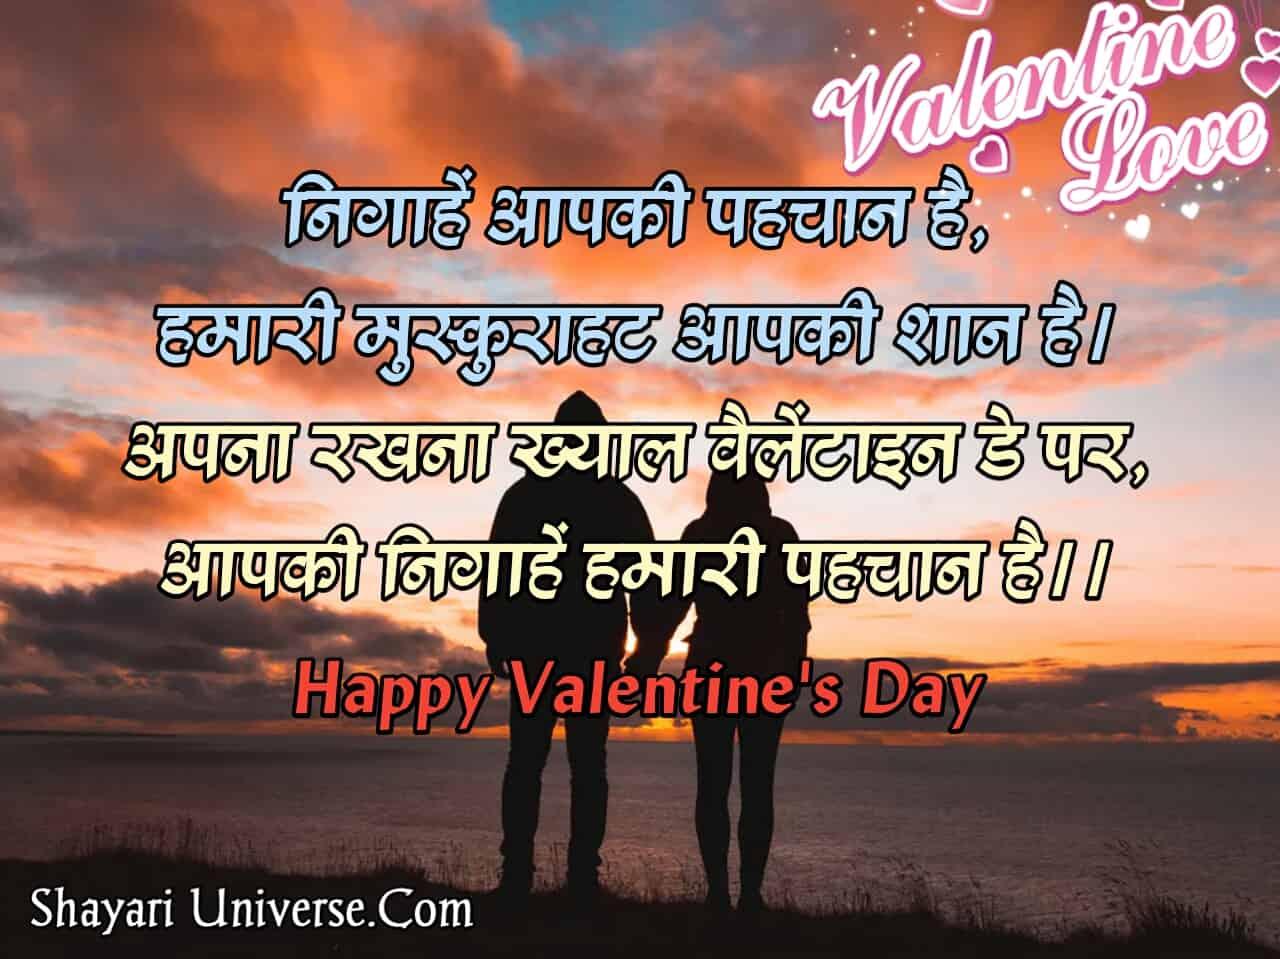 Valentine Day Shayari for Couples in Hindi